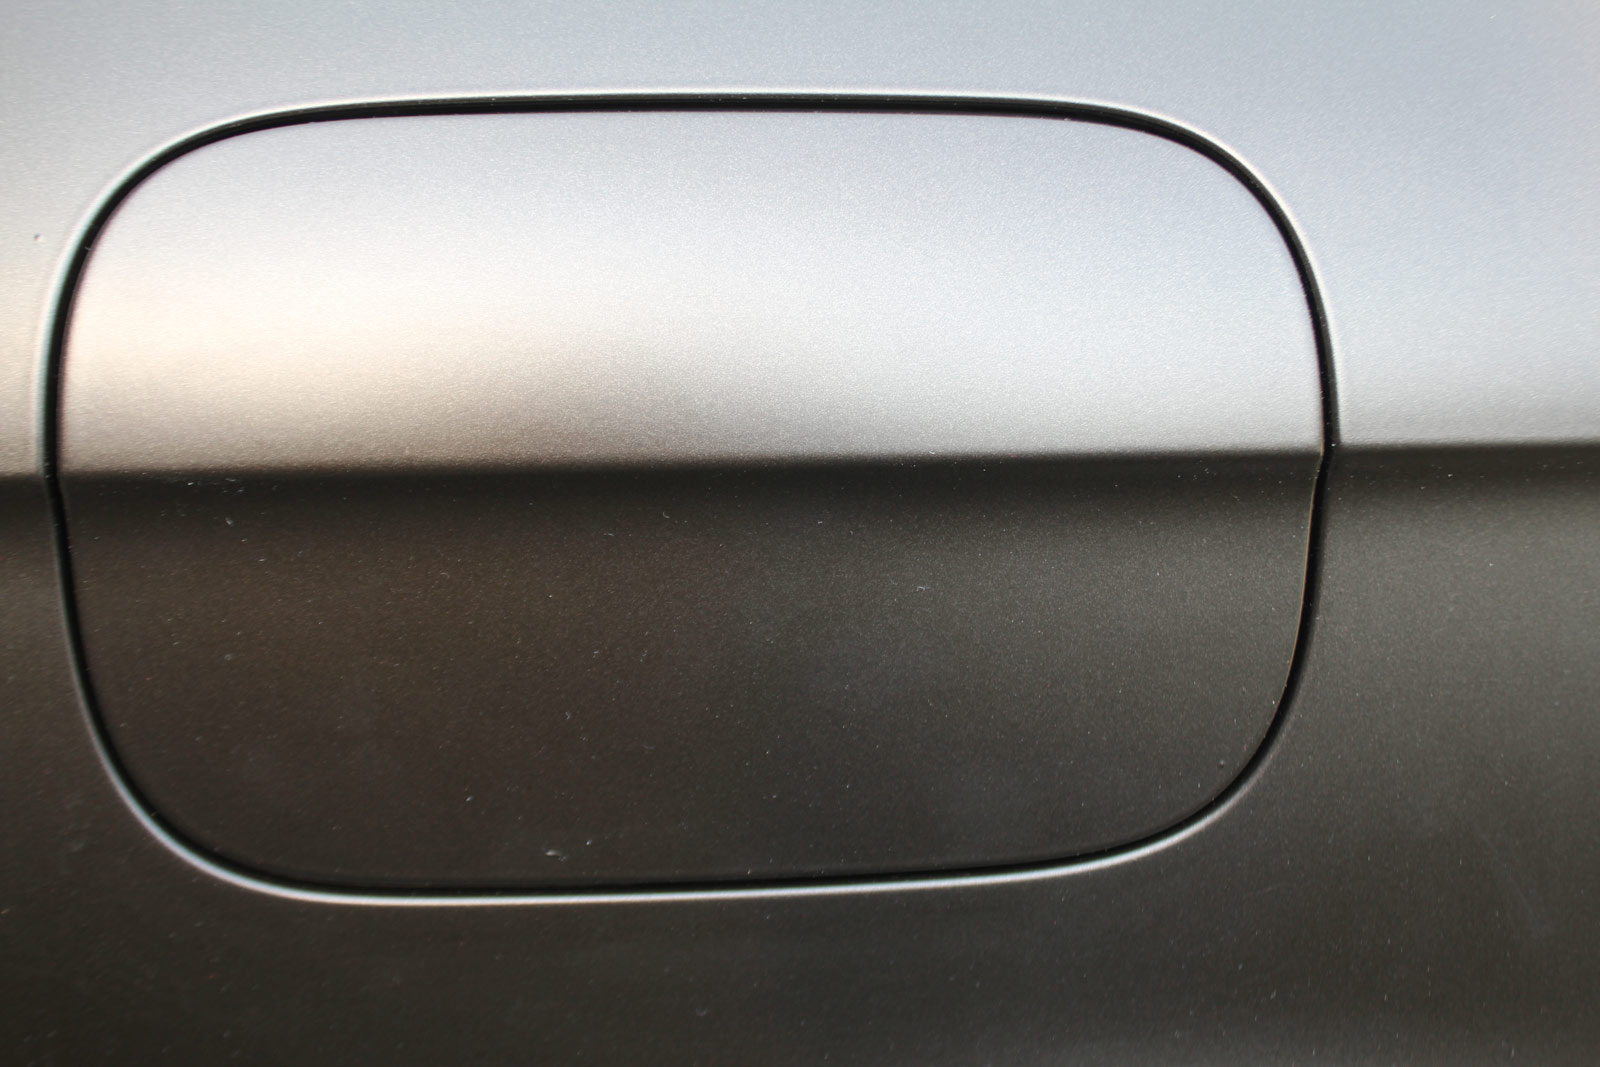 Audi_Q7_Folierung_Braun_Matt_Metallic_06